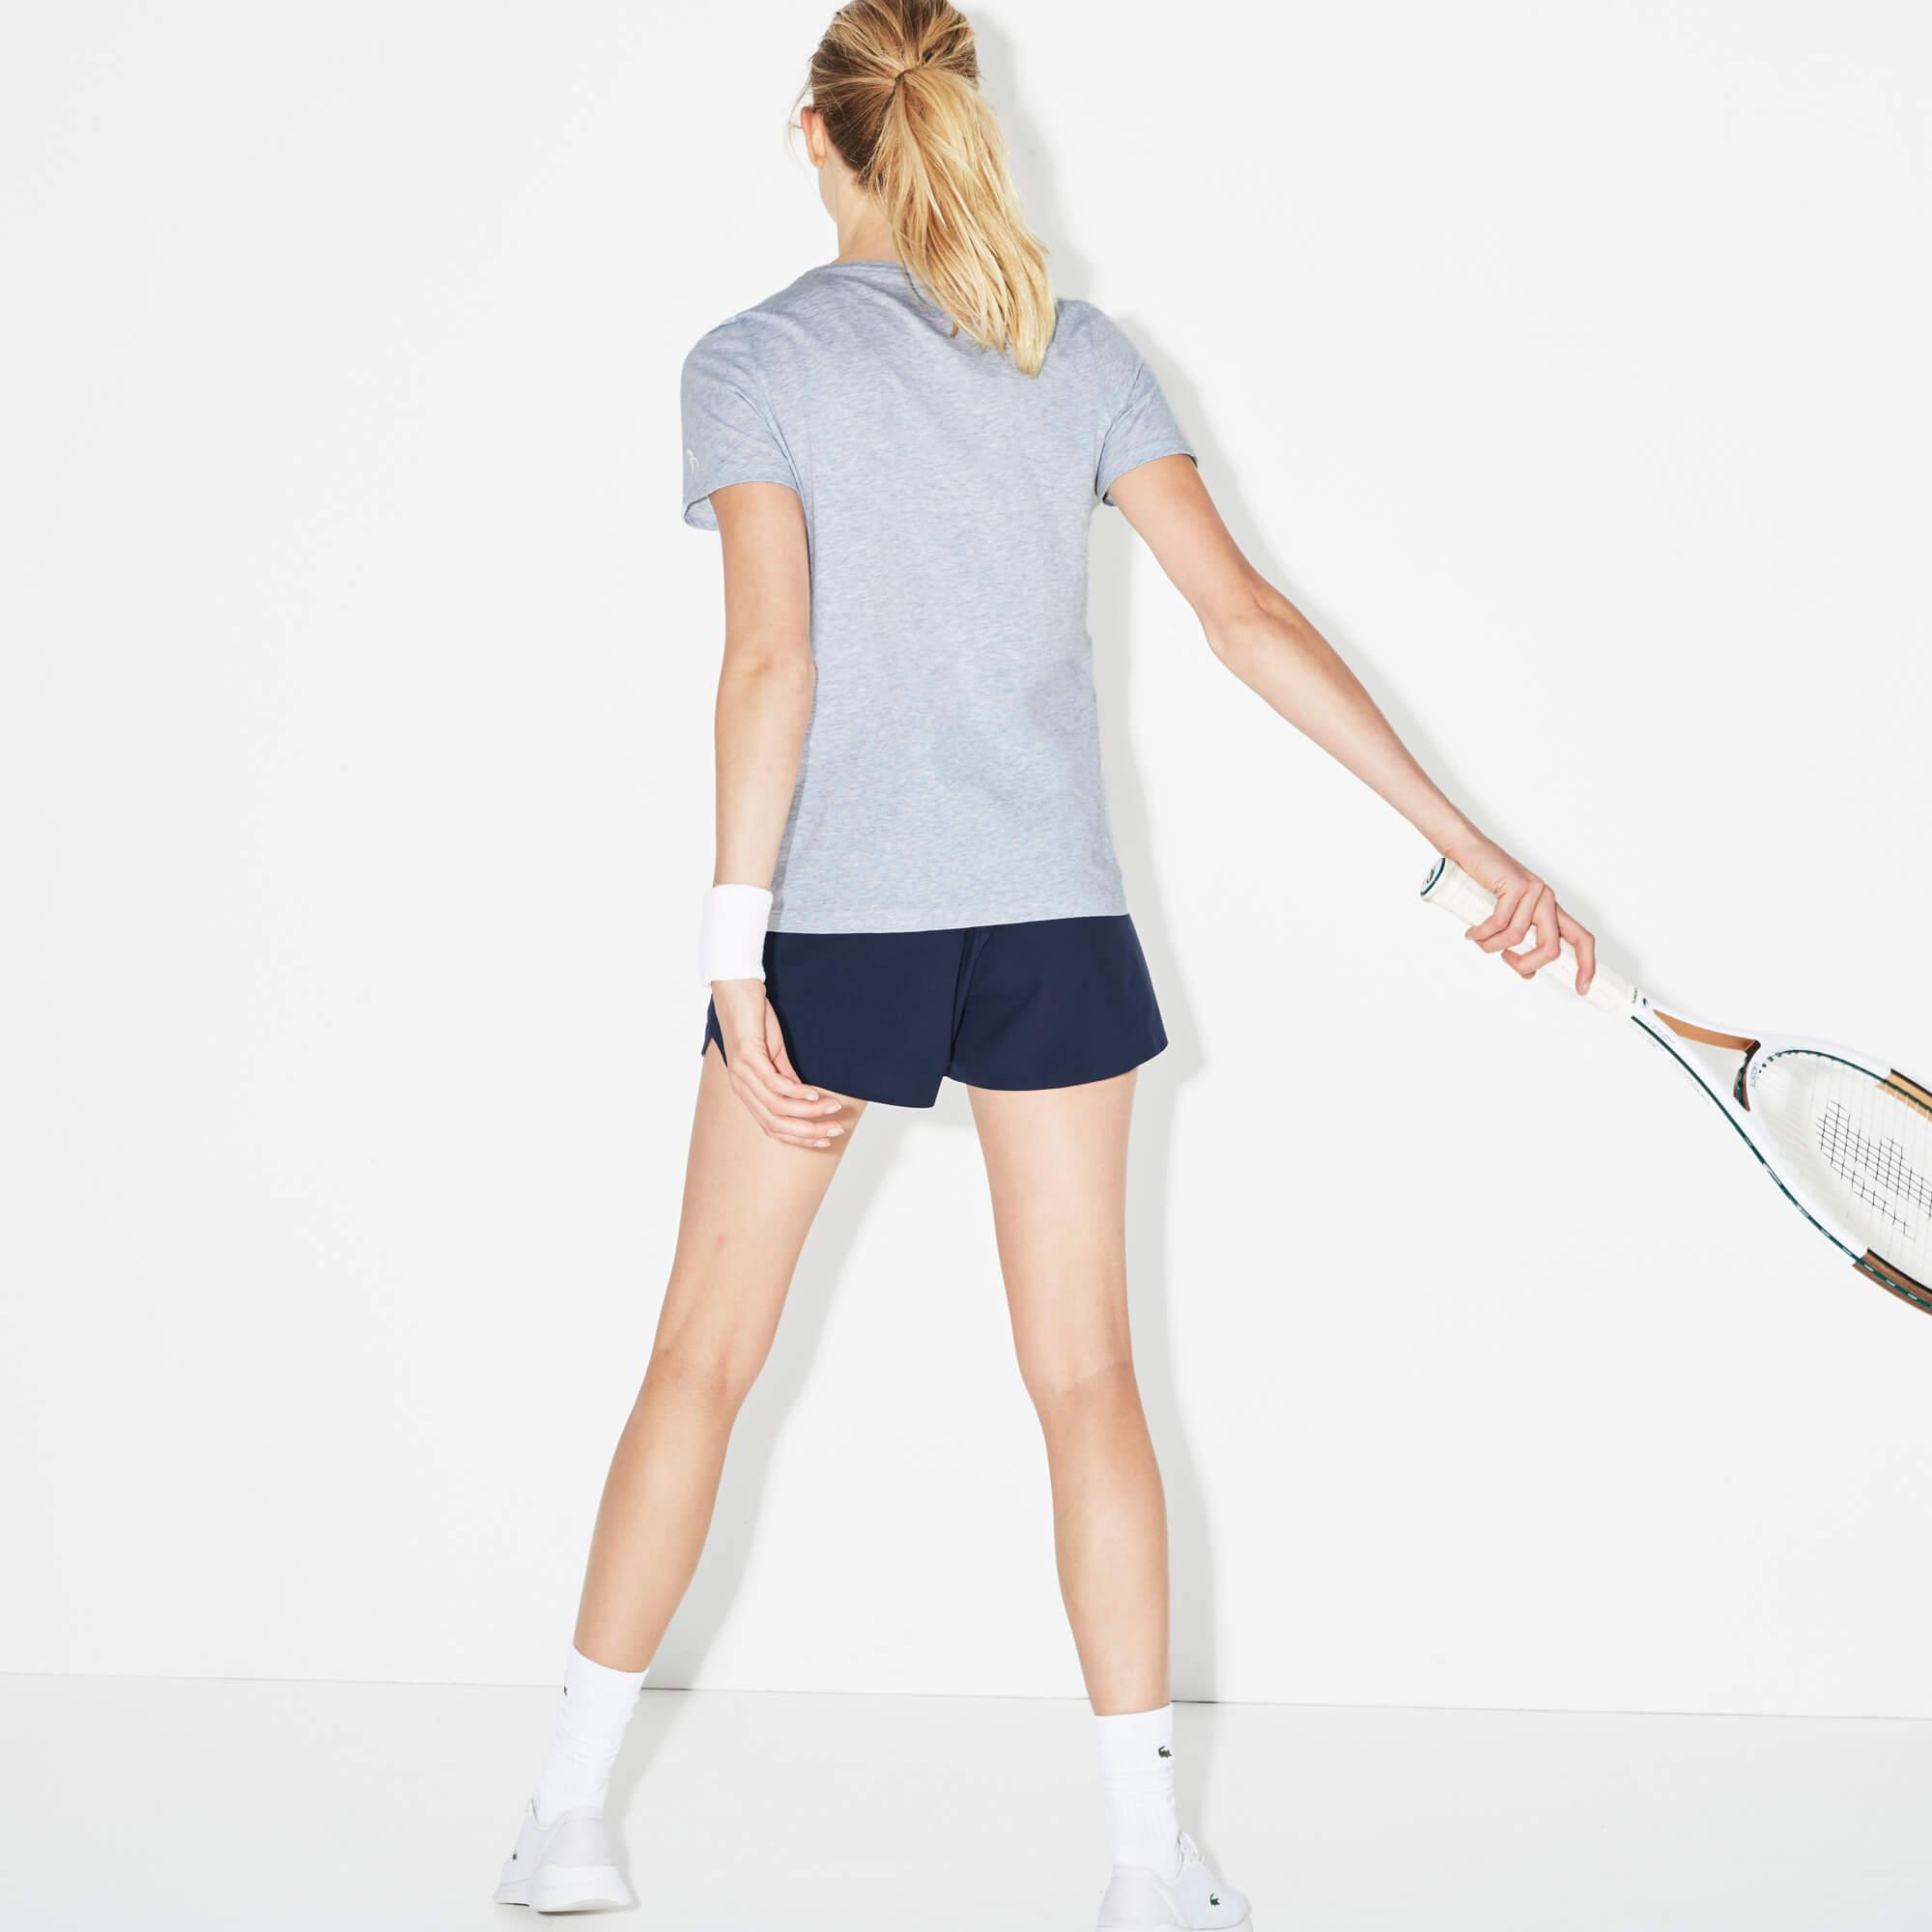 Lacoste Kadın Novak Djokovic Gri T-Shirt